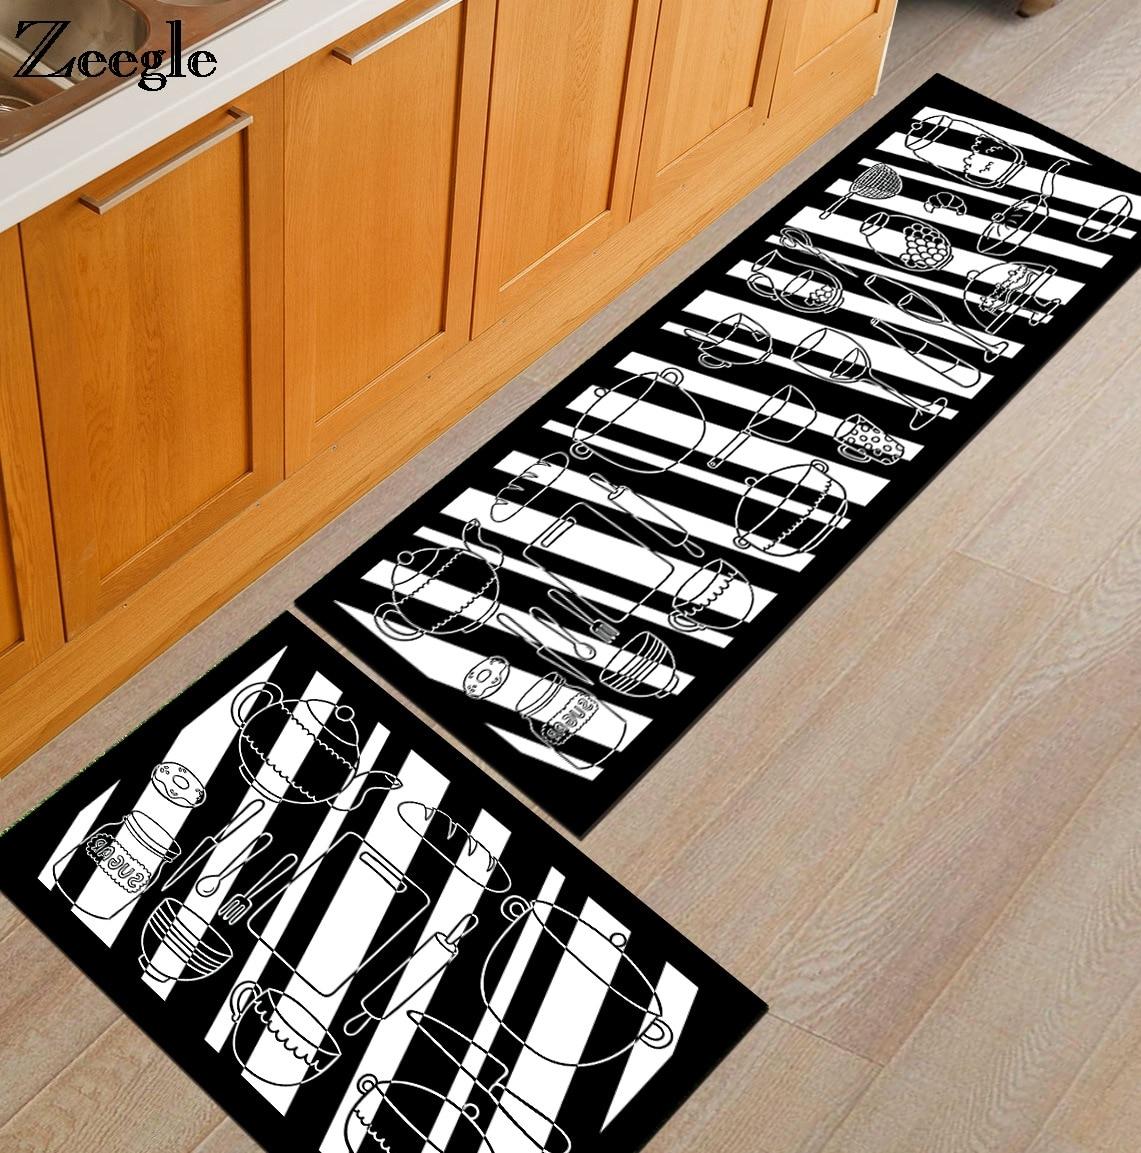 Us 7 25 44 Off Zeegle Cooking Utensil Printed Kitchen Rugs Anti Slip Coffee Table Floor Mats Home Dinging Room Area Rug Kitchen Floor Mats In Rug